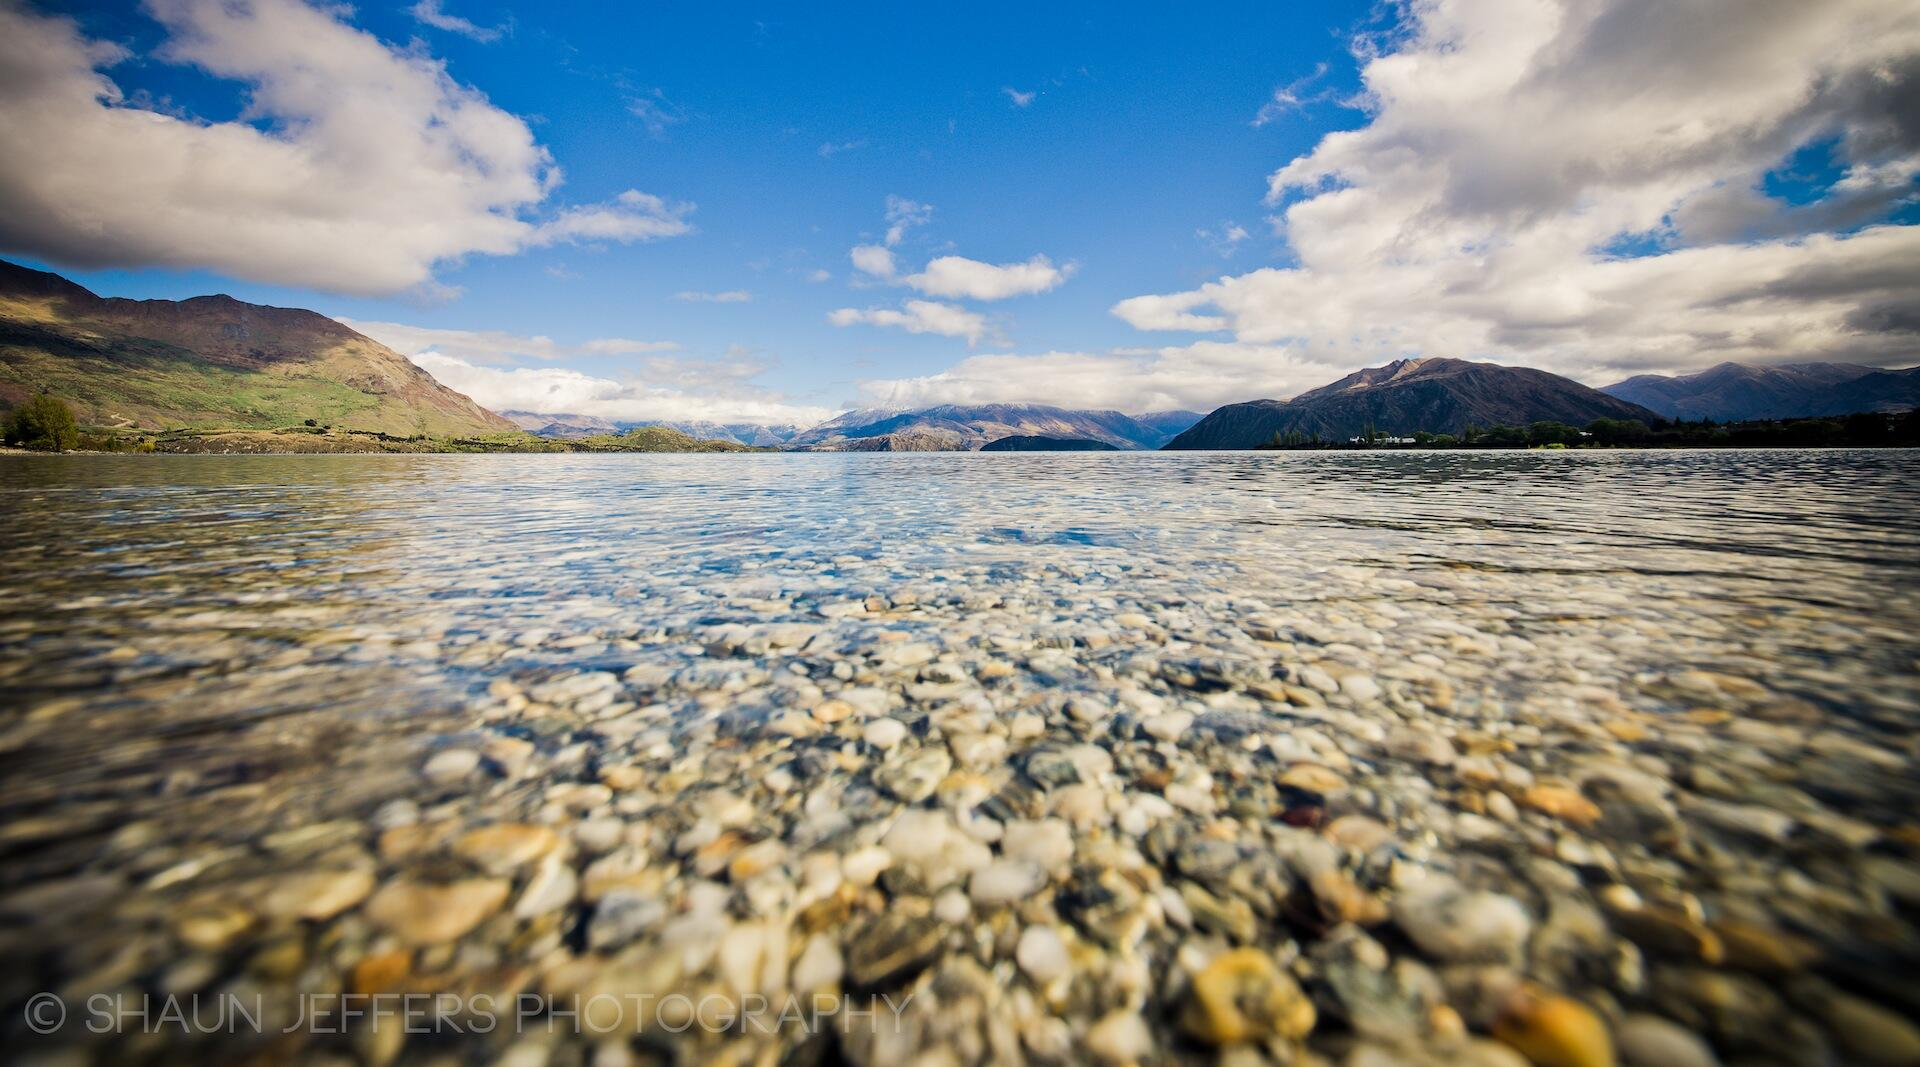 RT @shaun_jeffers: The @PureNewZealand lake water is just incredible... especially at @lakewanaka_nz http://t.co/iktk5YCZ1S